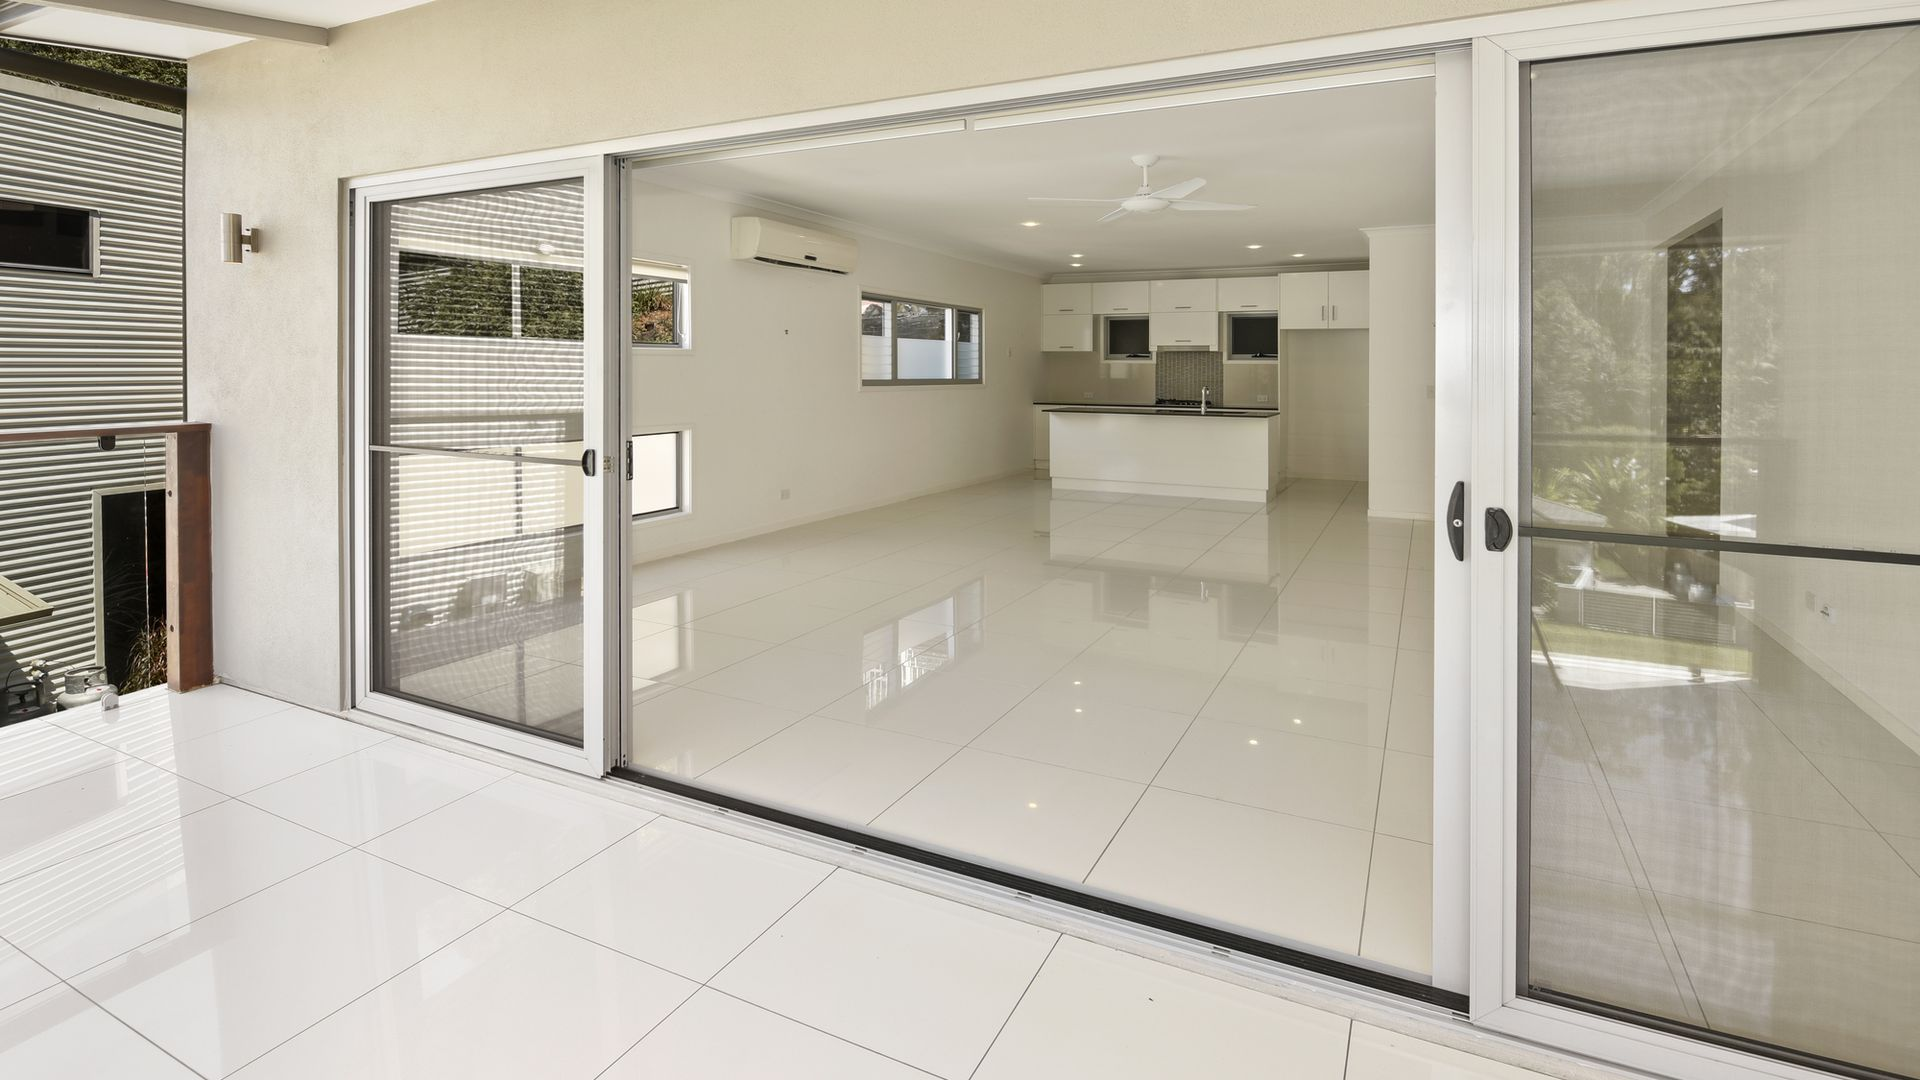 1/60 Martins Creek Road, Buderim QLD 4556, Image 2